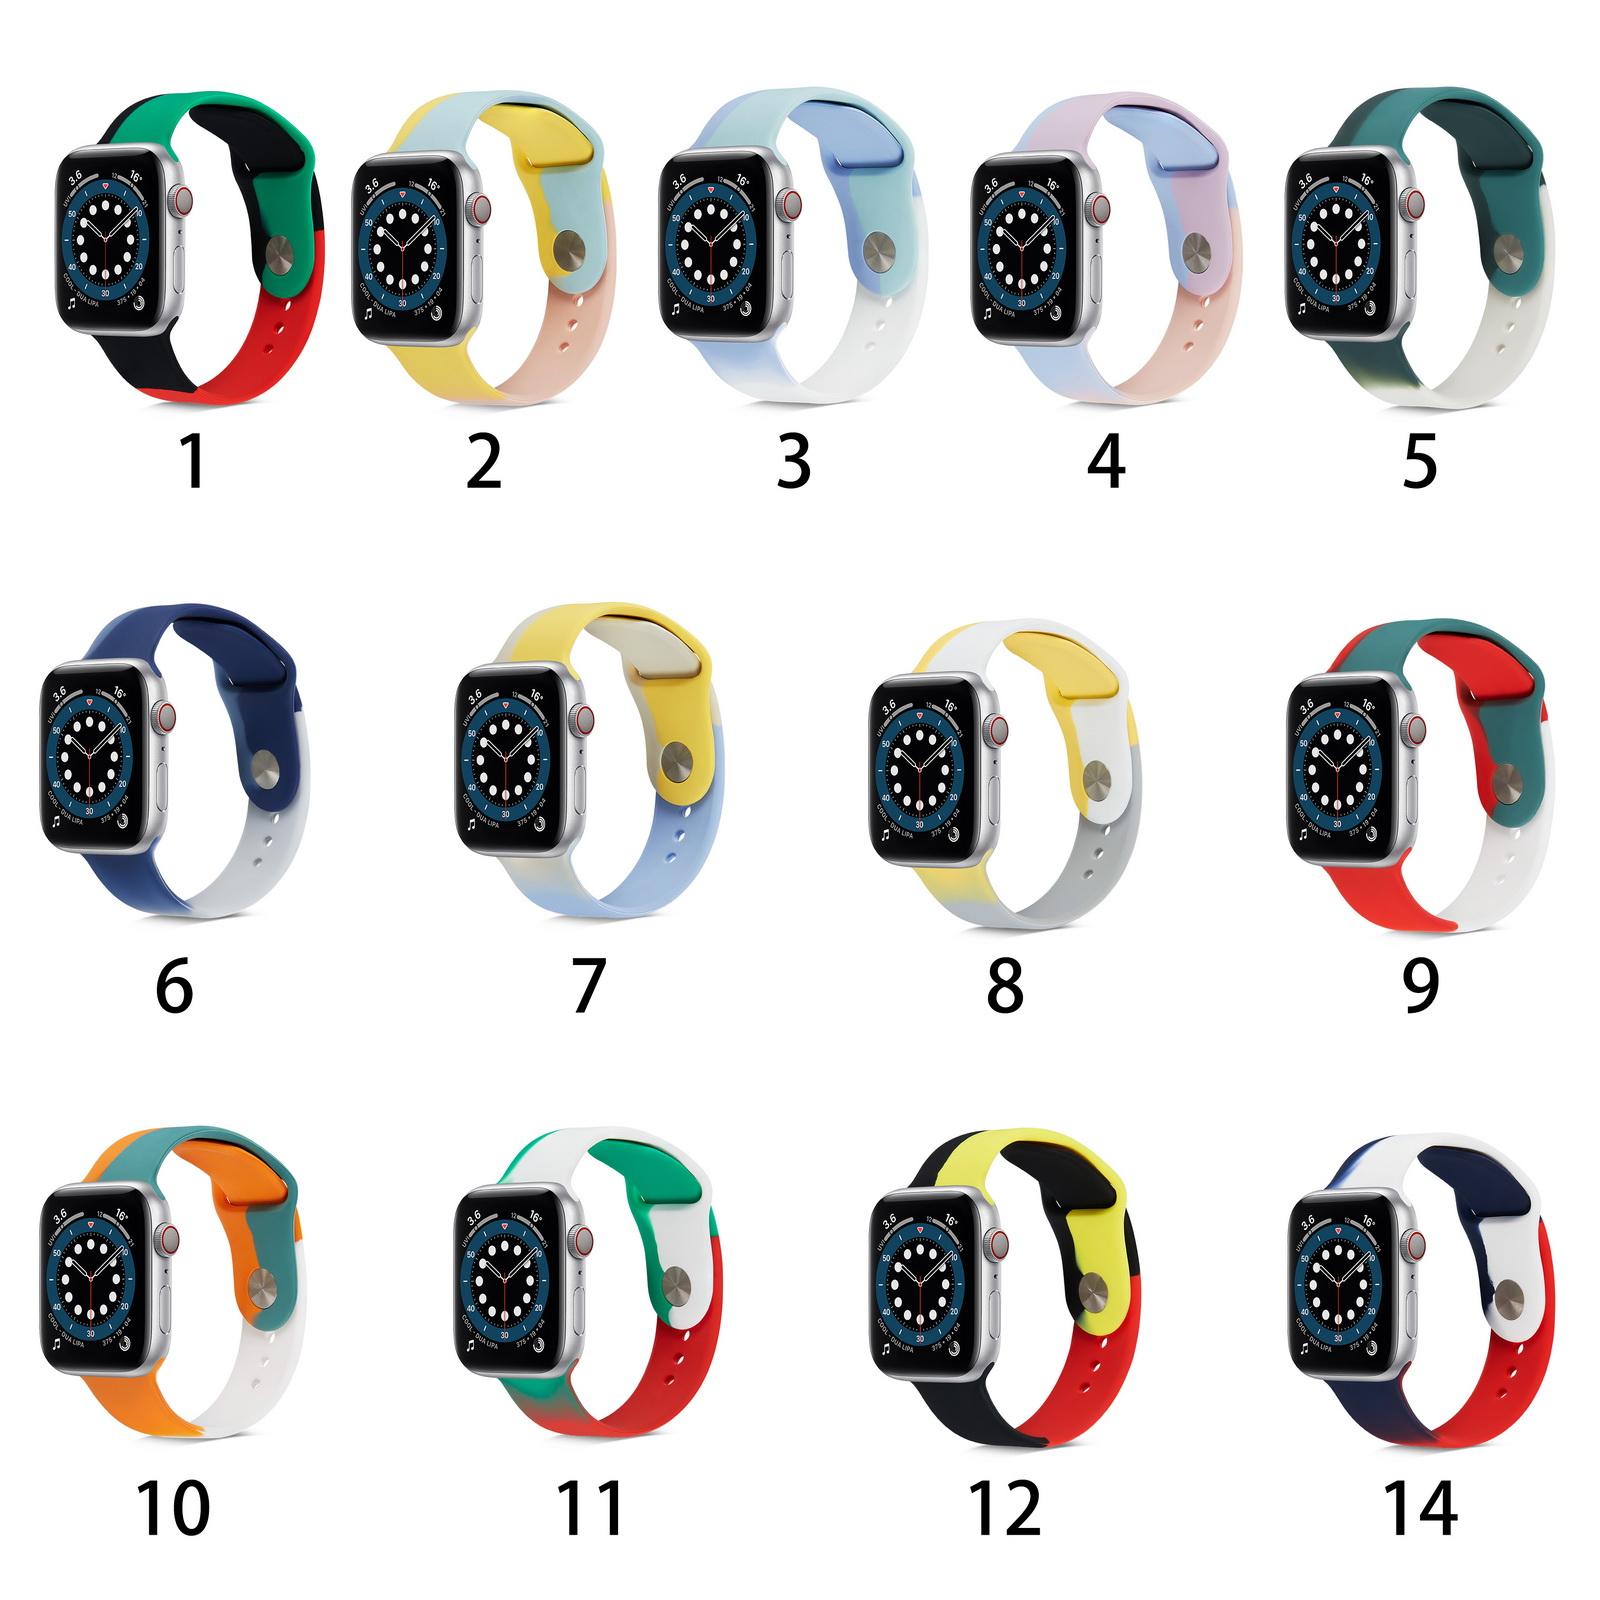 2021 Newst สายนาฬิกาข้อมือซิลิโคนสีรุ้งสําหรับ Apple Watch Band Series 6 5 4 3 2 1 Se Design 42 มม . 38 มม .